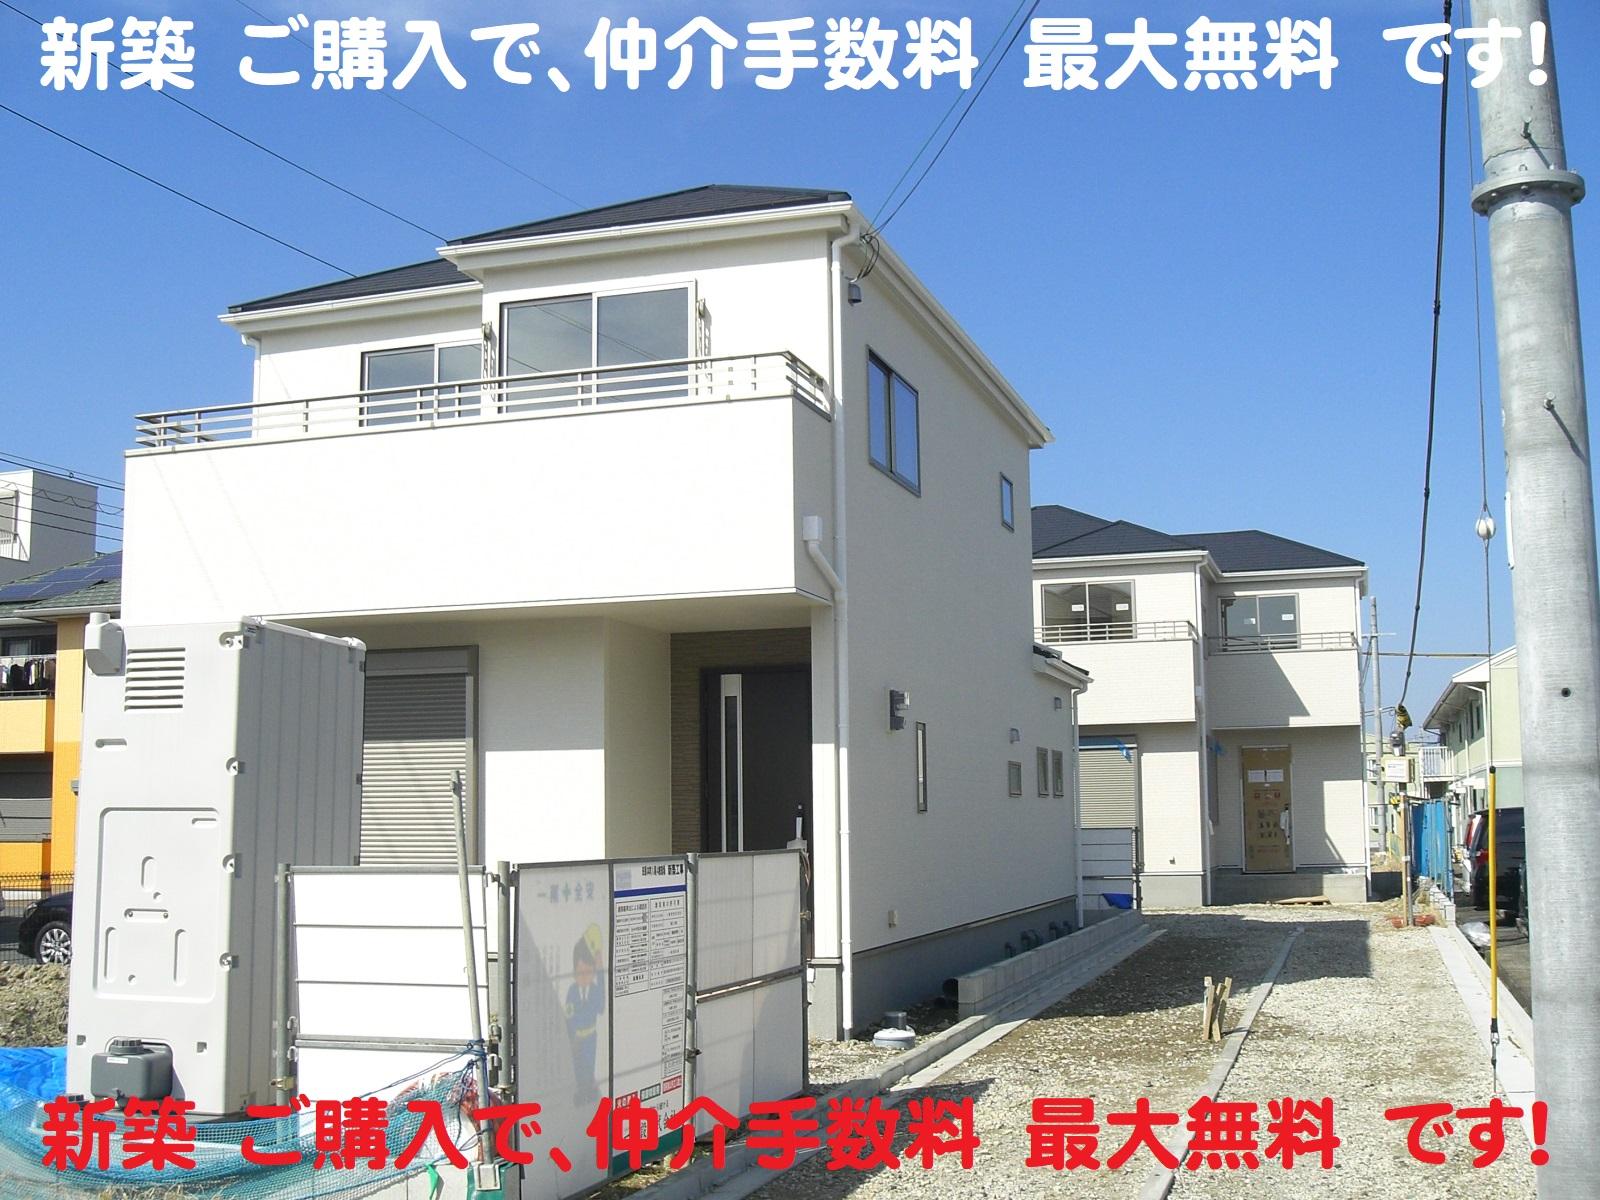 田原本町 八尾 新築 全4棟 現地 画像 建物 飯田グループ 一建設 お買い得